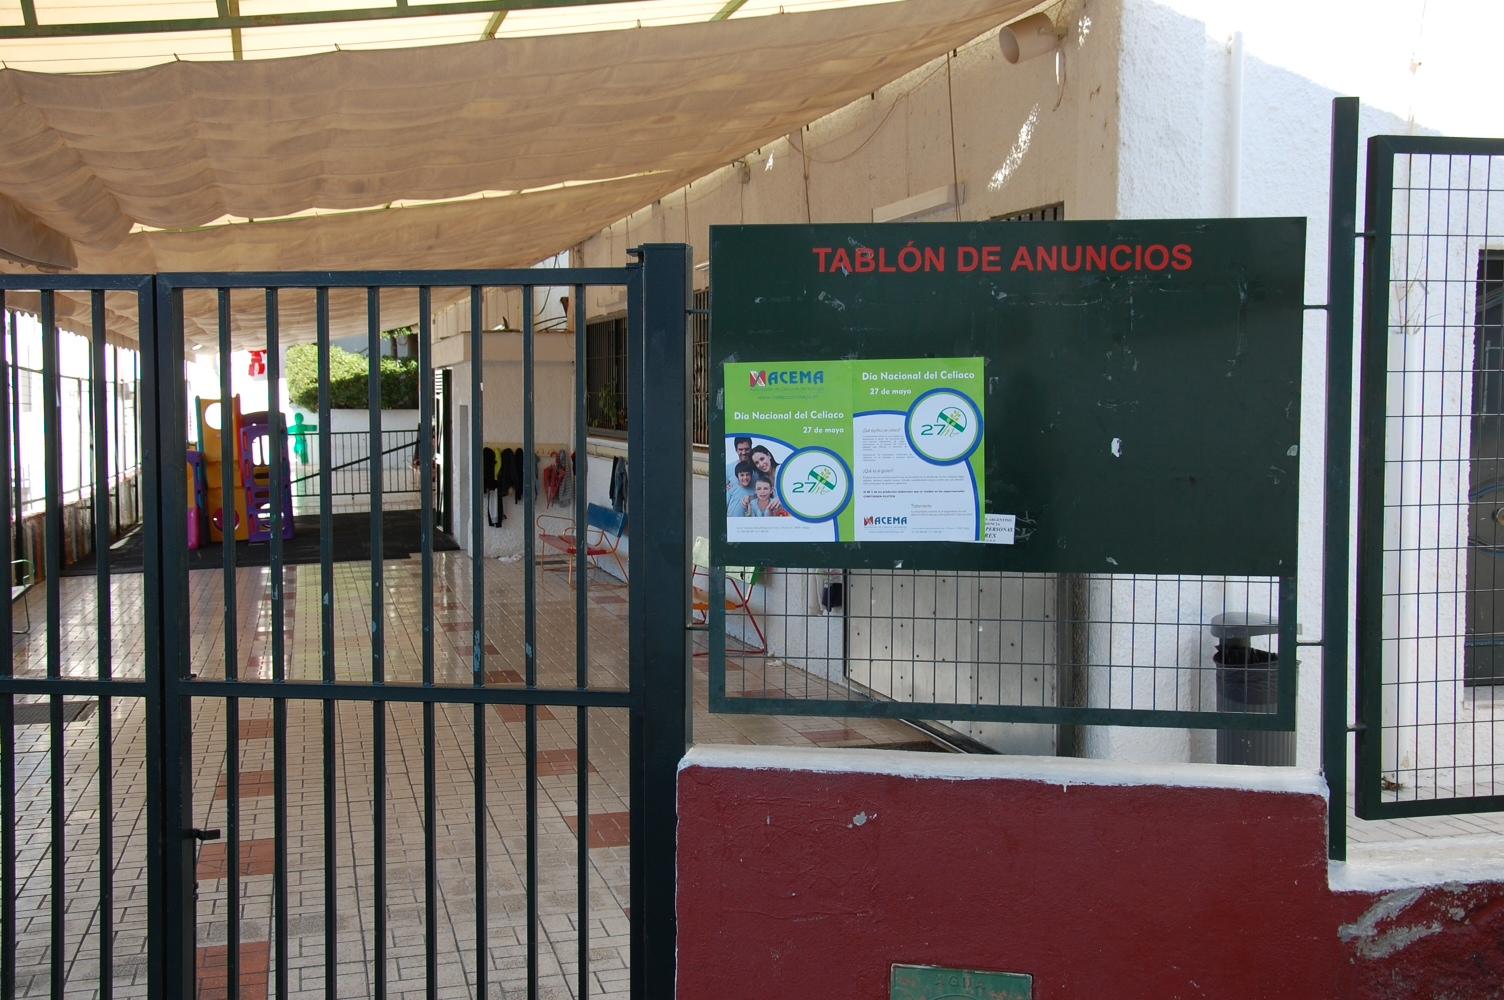 Dia del Celiaco Rincon Victoria Colegio 02